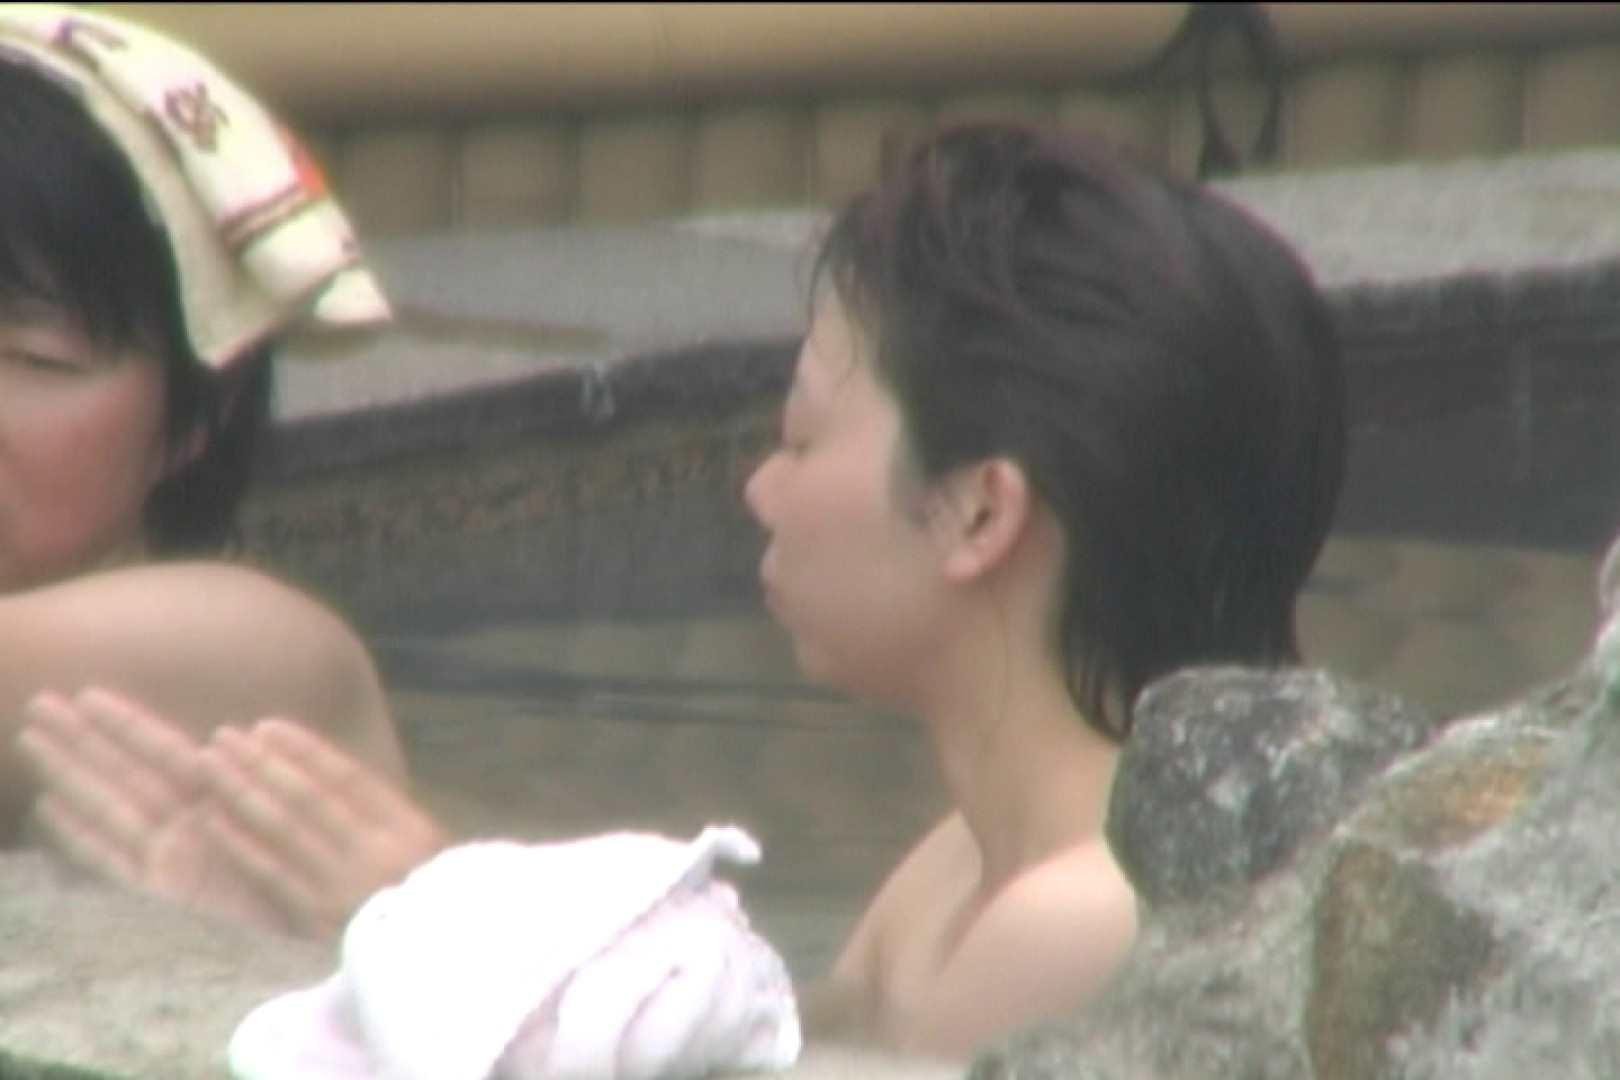 Aquaな露天風呂Vol.122 HなOL  107pic 80